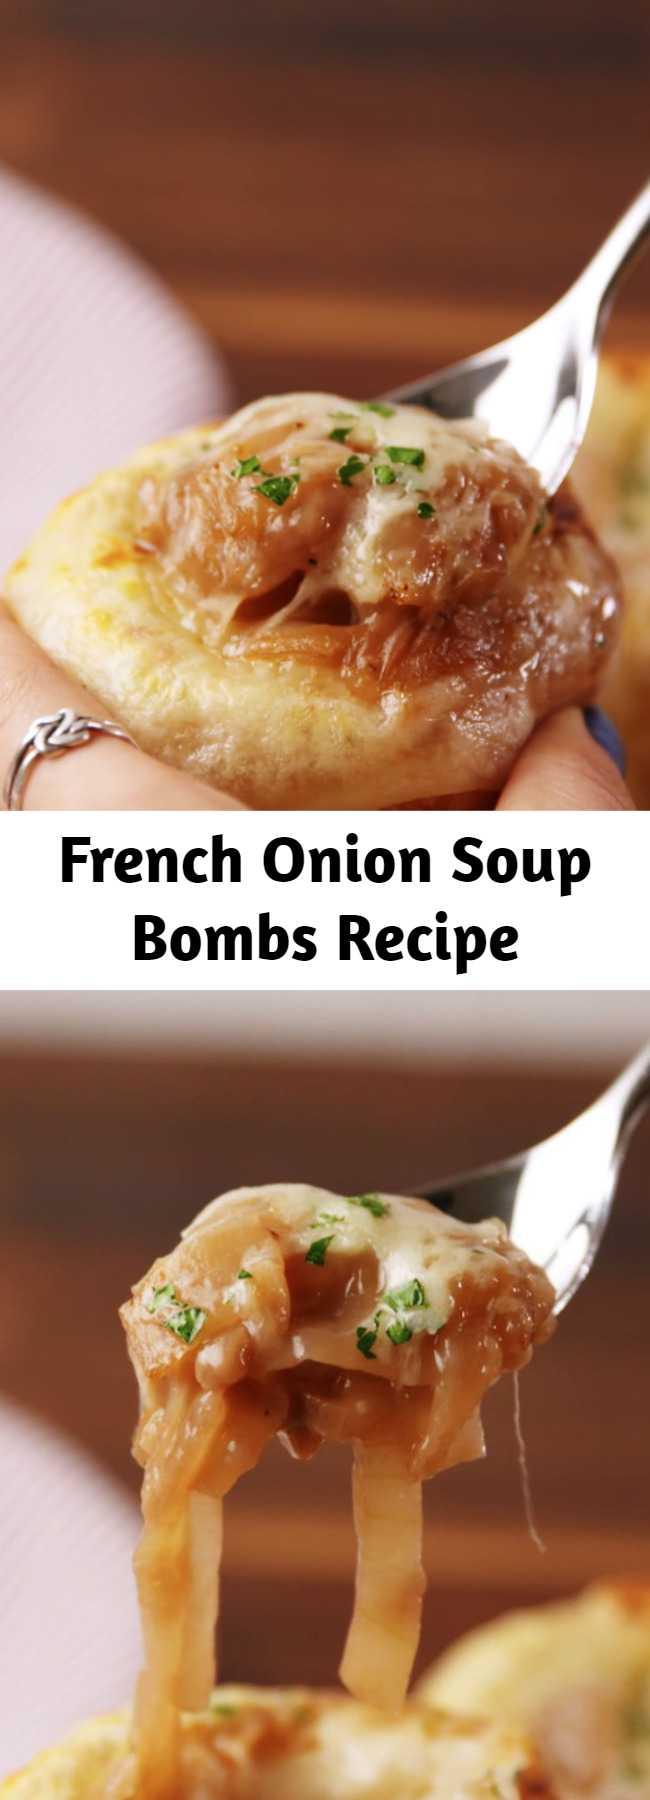 French Onion Soup Bombs Recipe - Mini bread bowls are SO CUTE. #easy #recipe #soup #mini #bites #bombs #frenchonion #onion #winter #appetizer